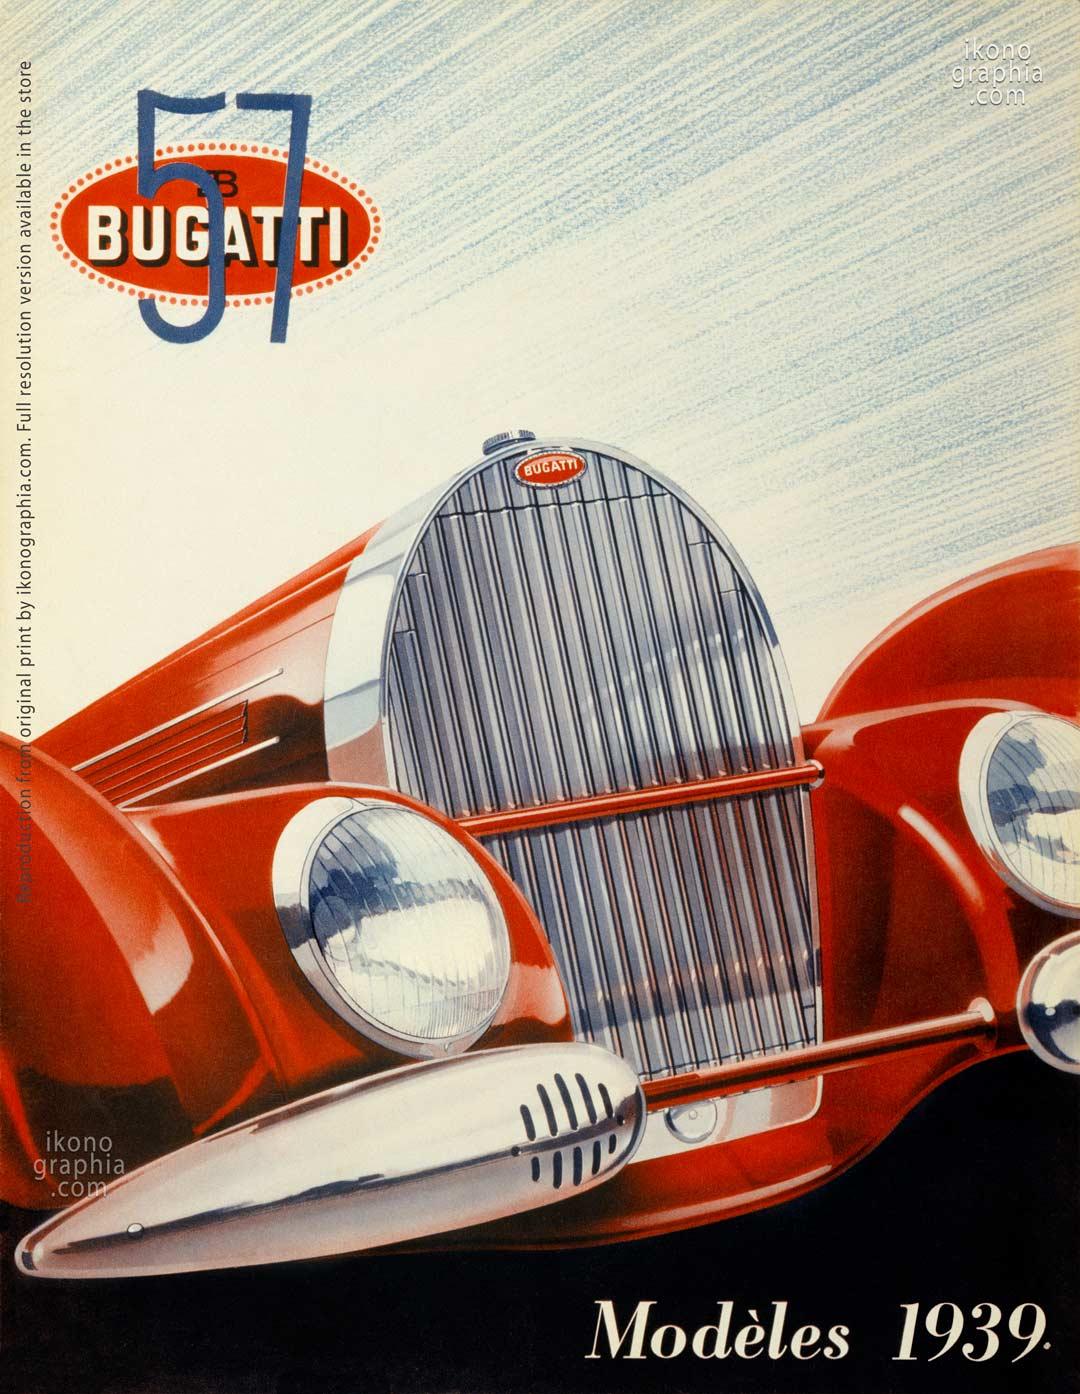 Bugatti Type 57 Modeles 1939